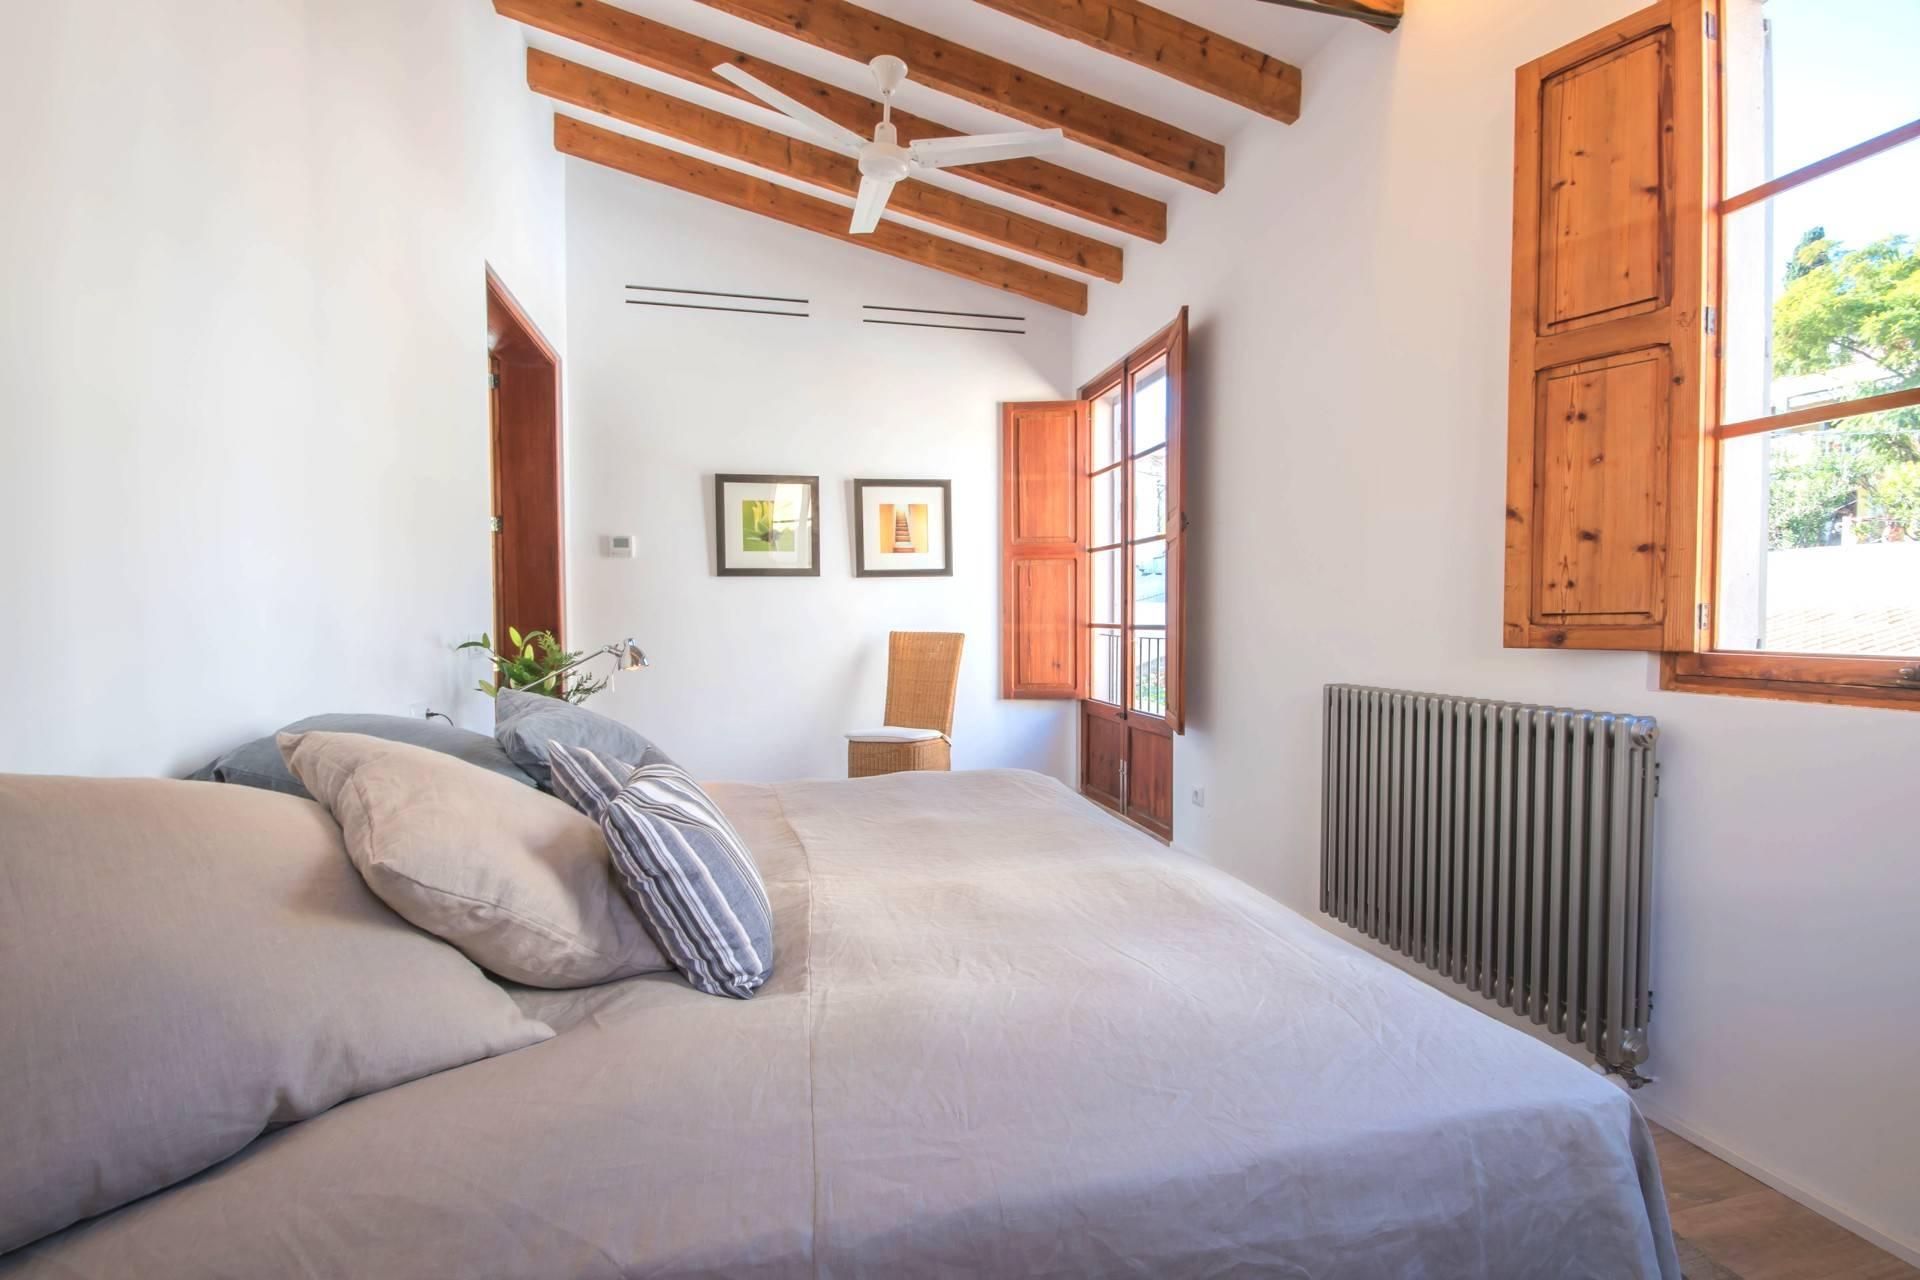 01-257 Luxus Ferienhaus Mallorca Südwesten Bild 20